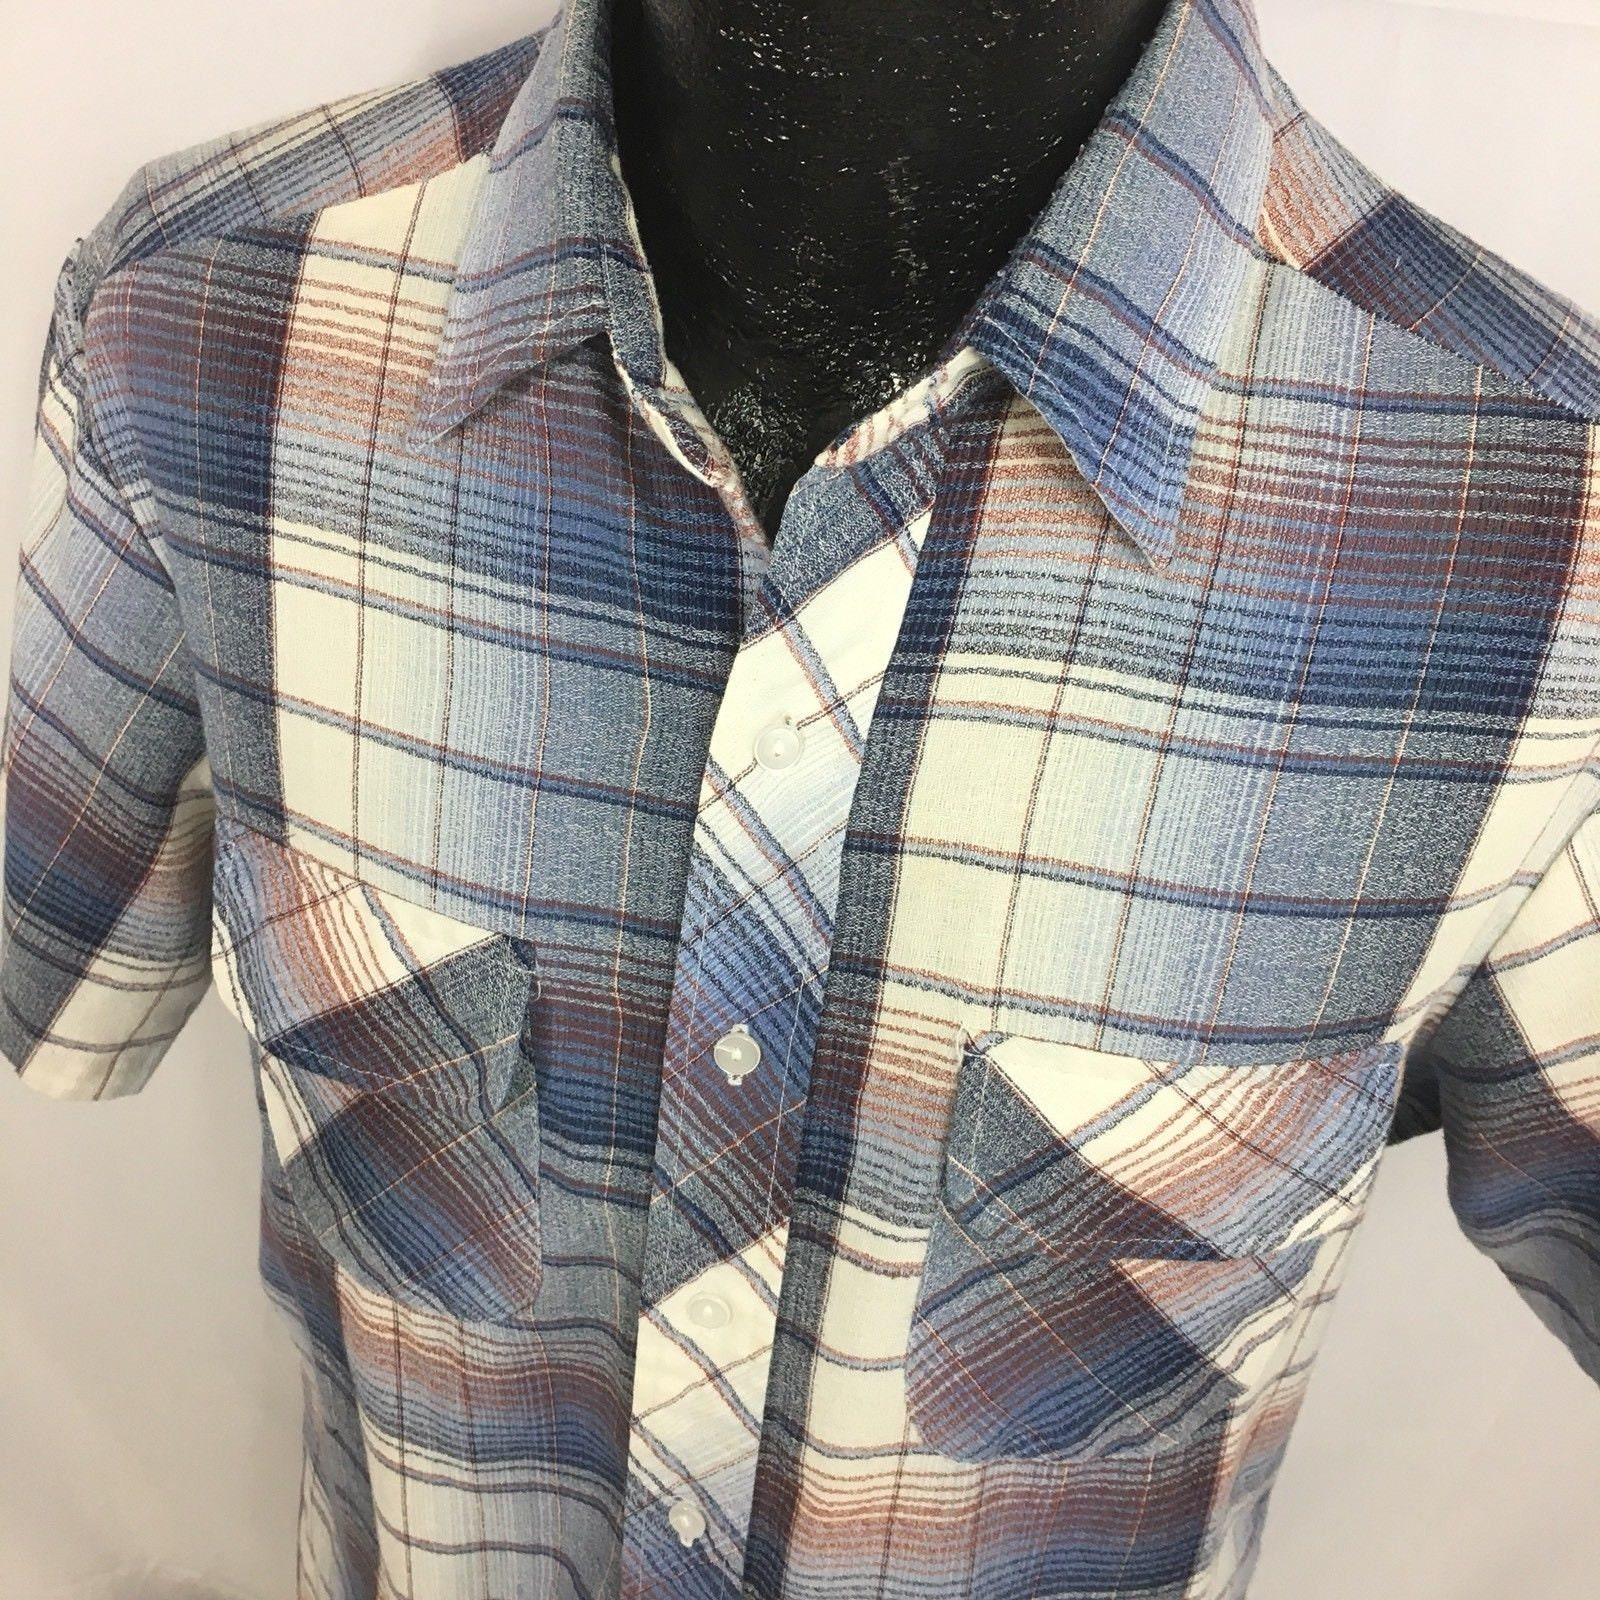 1960s – 70s Men's Ties | Skinny Ties, Slim Ties Vintage 1950 60s Mens Blue Plaid Check Thin Barkcloth Button Up Flap Pocket Shirt L $59.99 AT vintagedancer.com